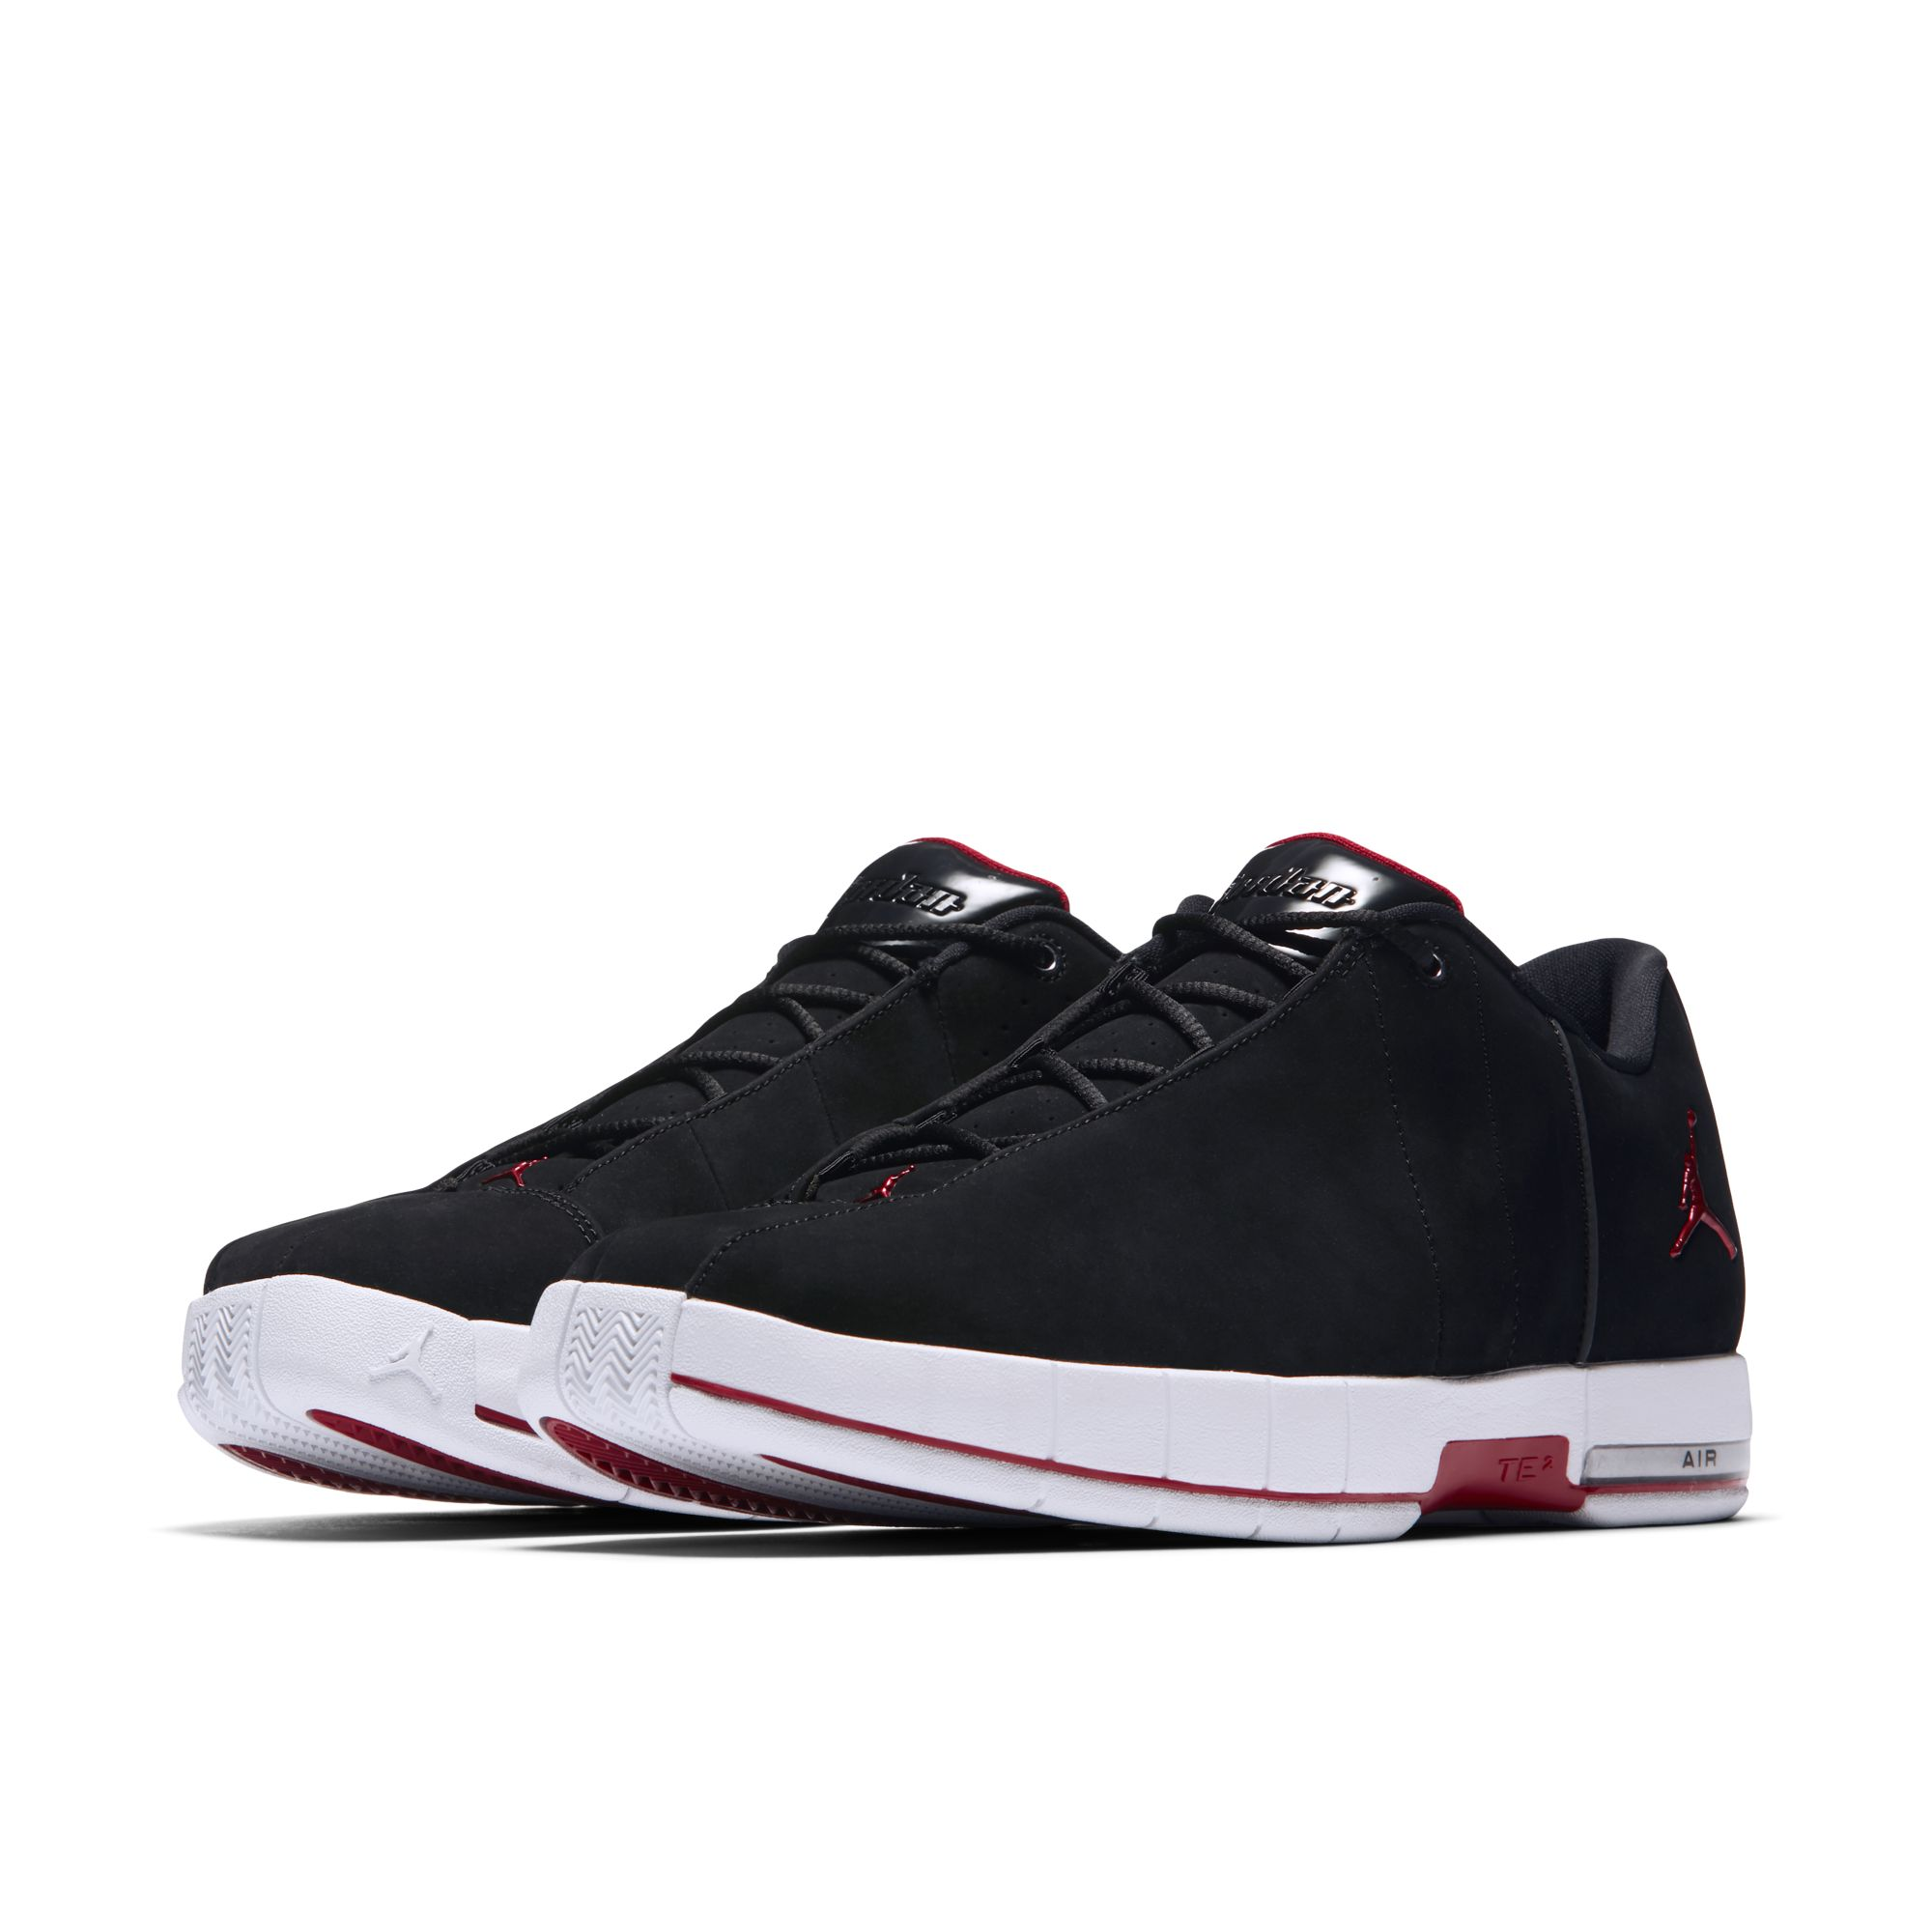 Jordan-Team-Elite-2-Low-Black-Red-4